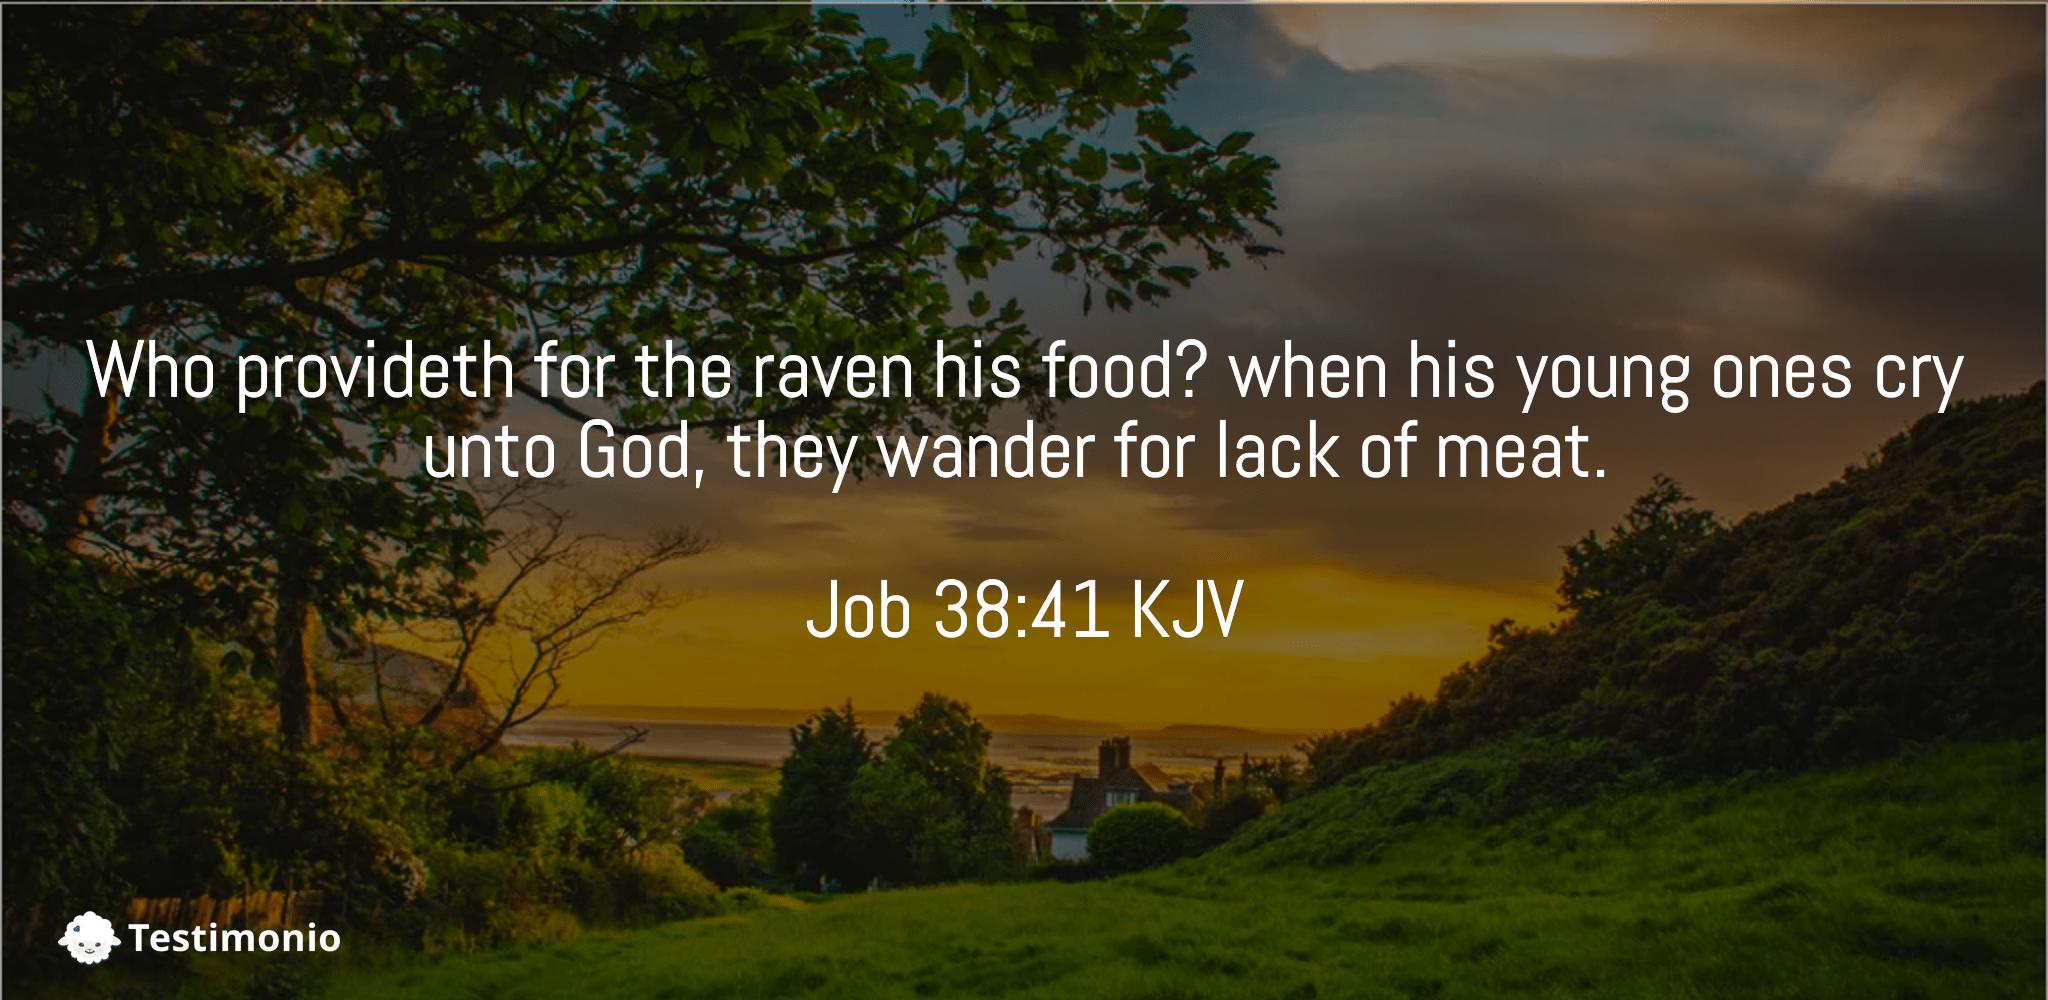 Job 38:41